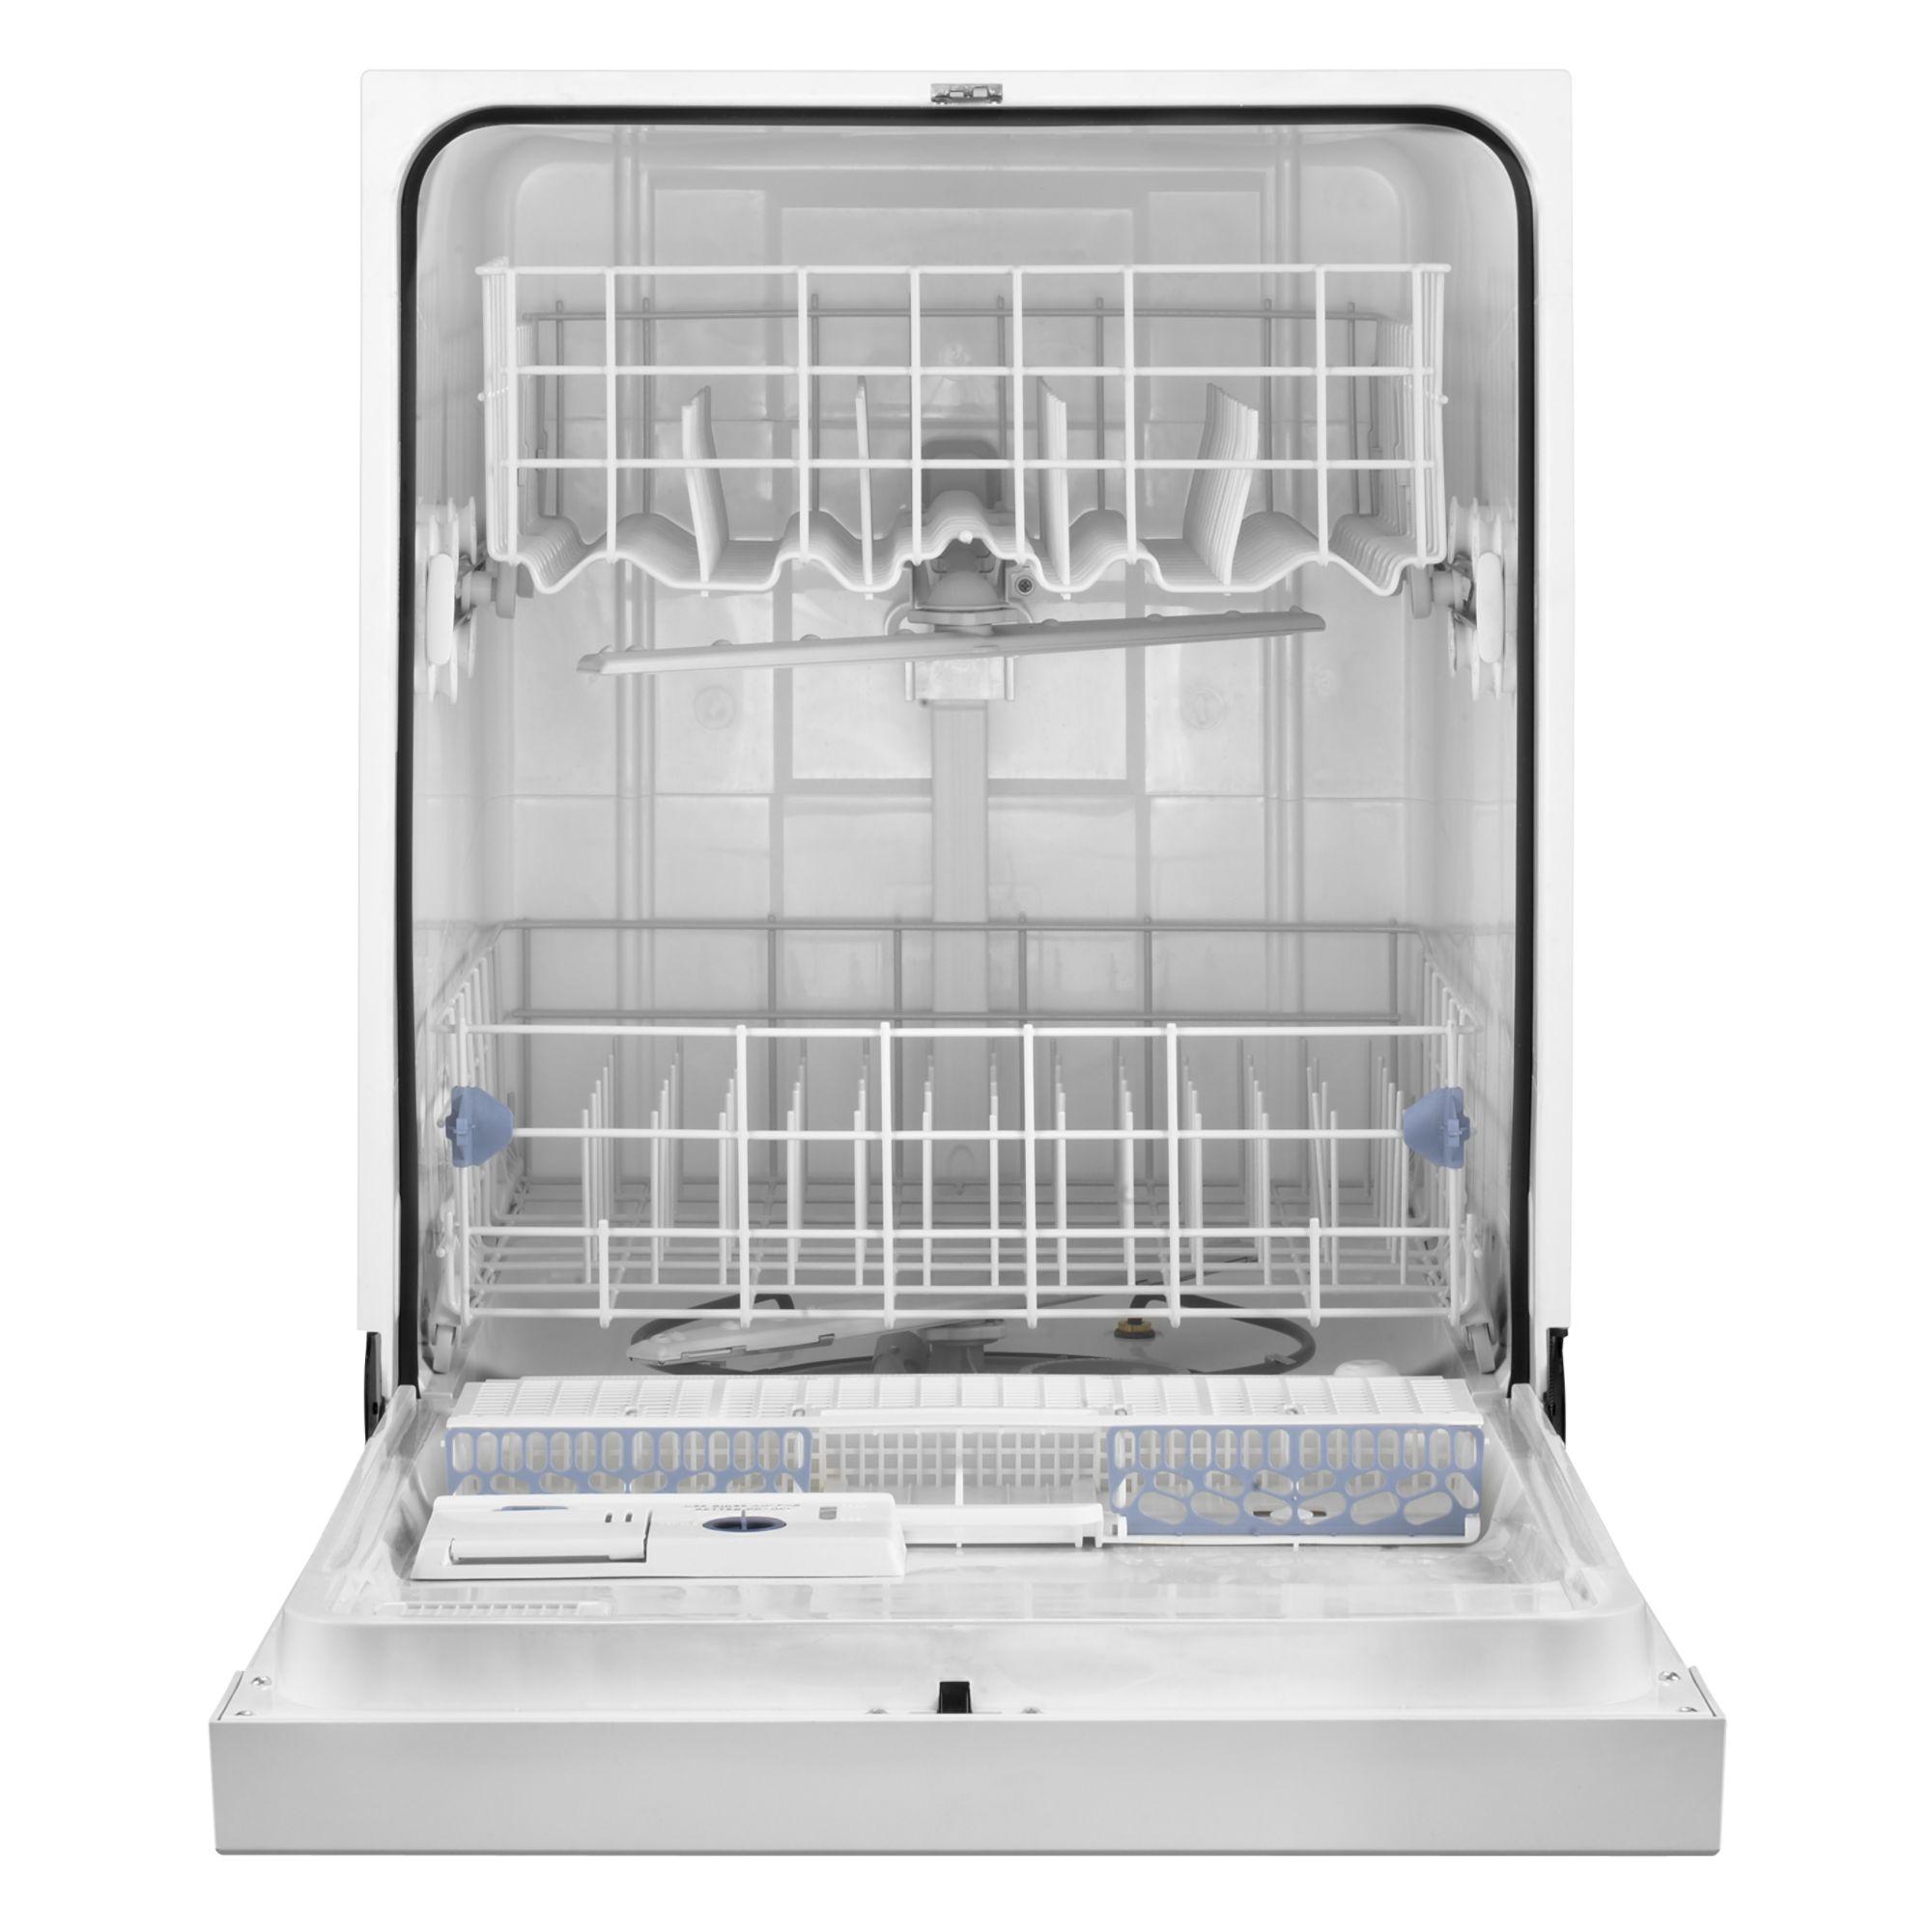 "Whirlpool 24"" Dishwasher w/ AnyWare™ Plus Silverware Basket - Bisque"